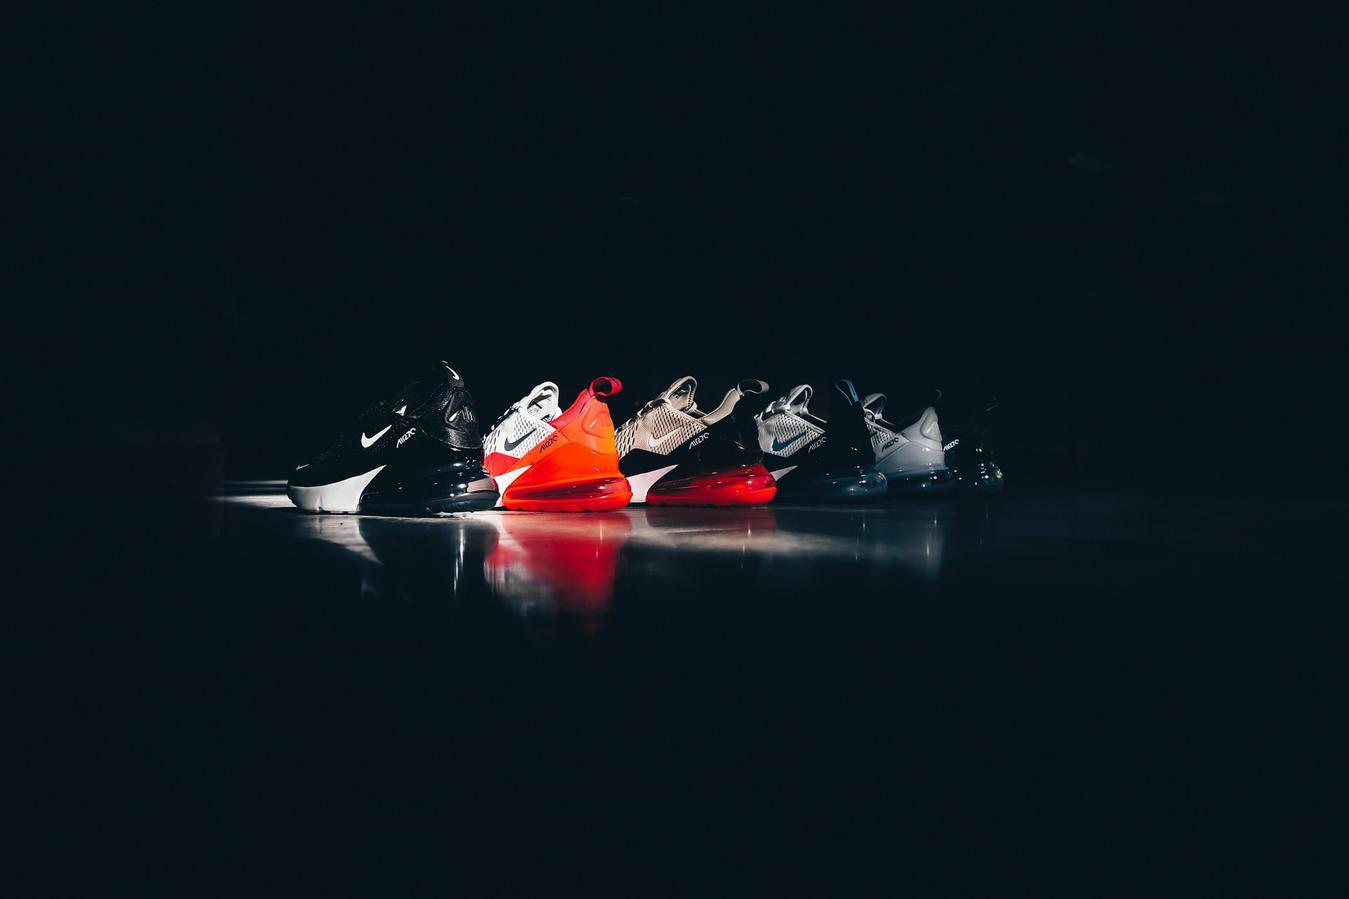 Nike Sneakers Red in Black Background